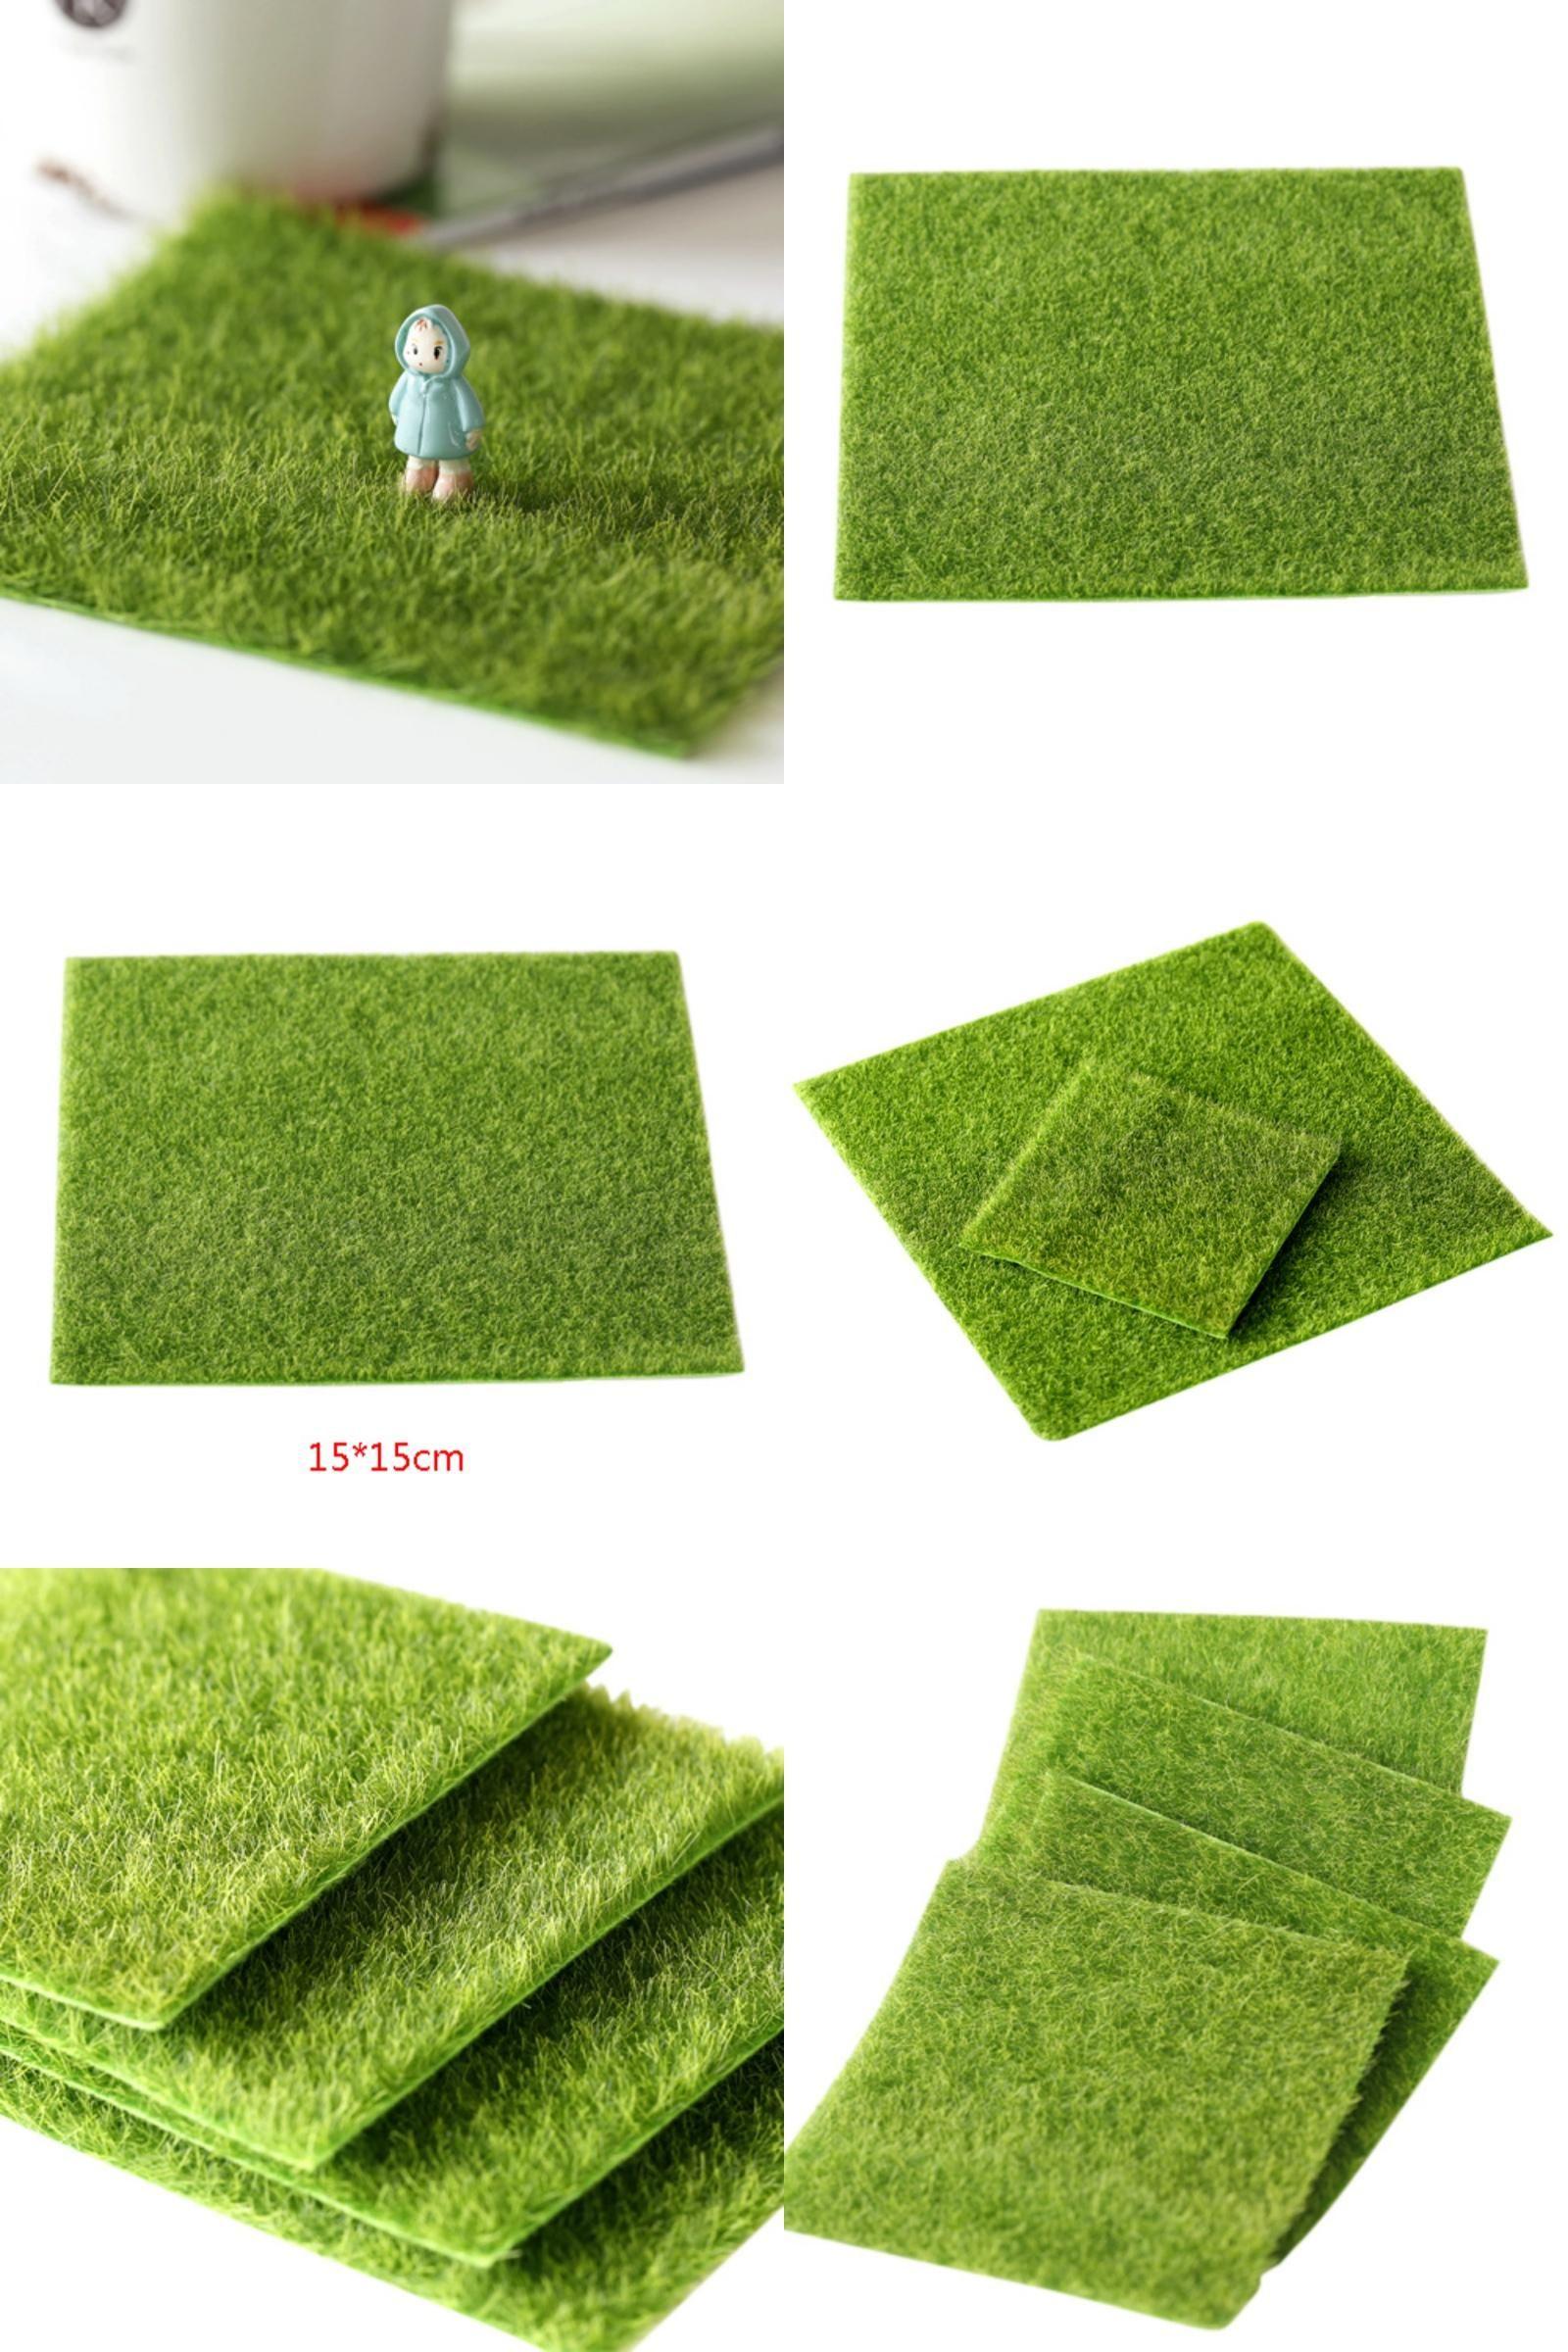 Micro Landscape Decoration DIY Fairy Garden Plant Simulation False Moss Grass#